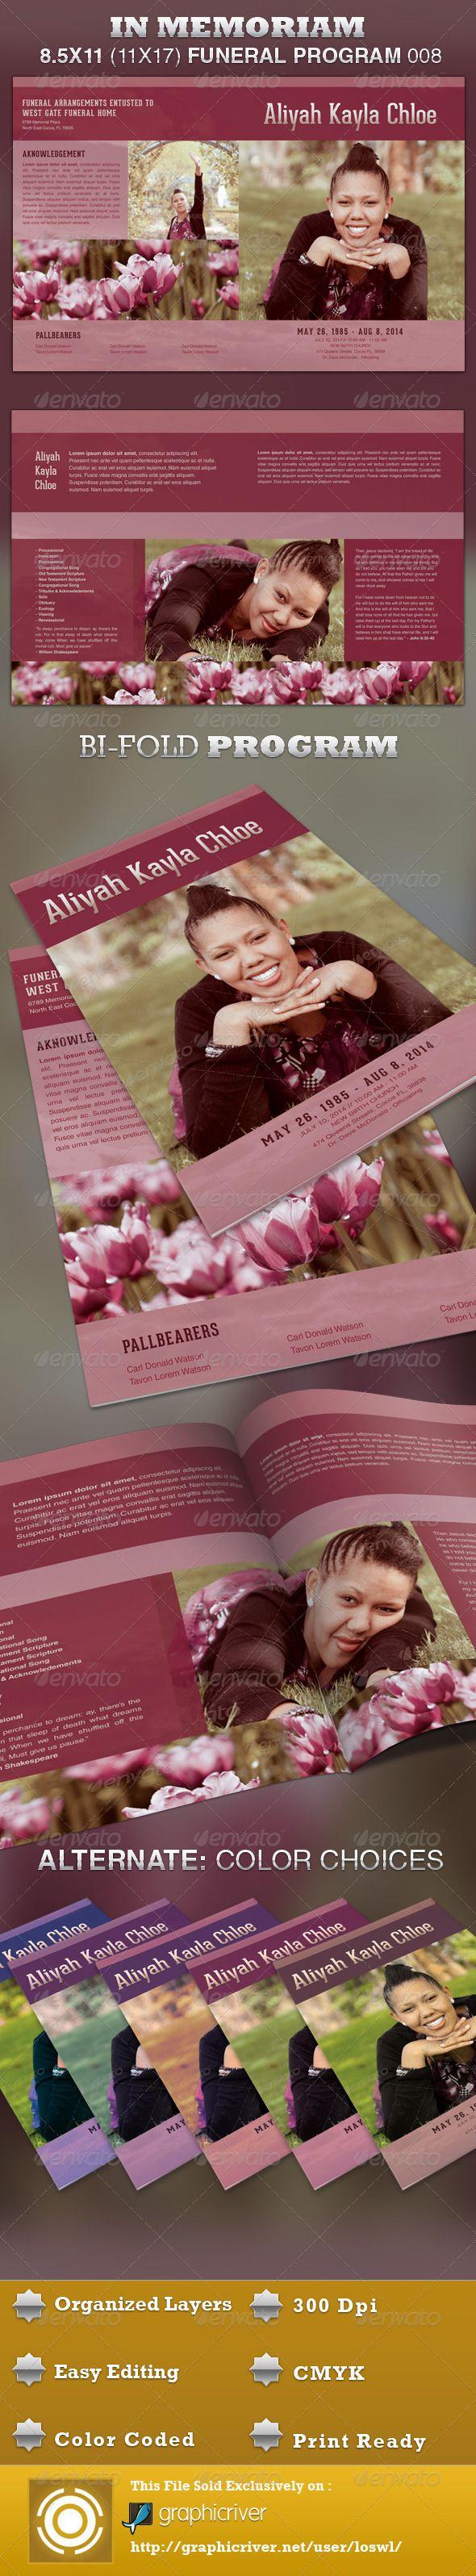 In Memoriam Funeral Program Template 008 | Pinterest | Program ...